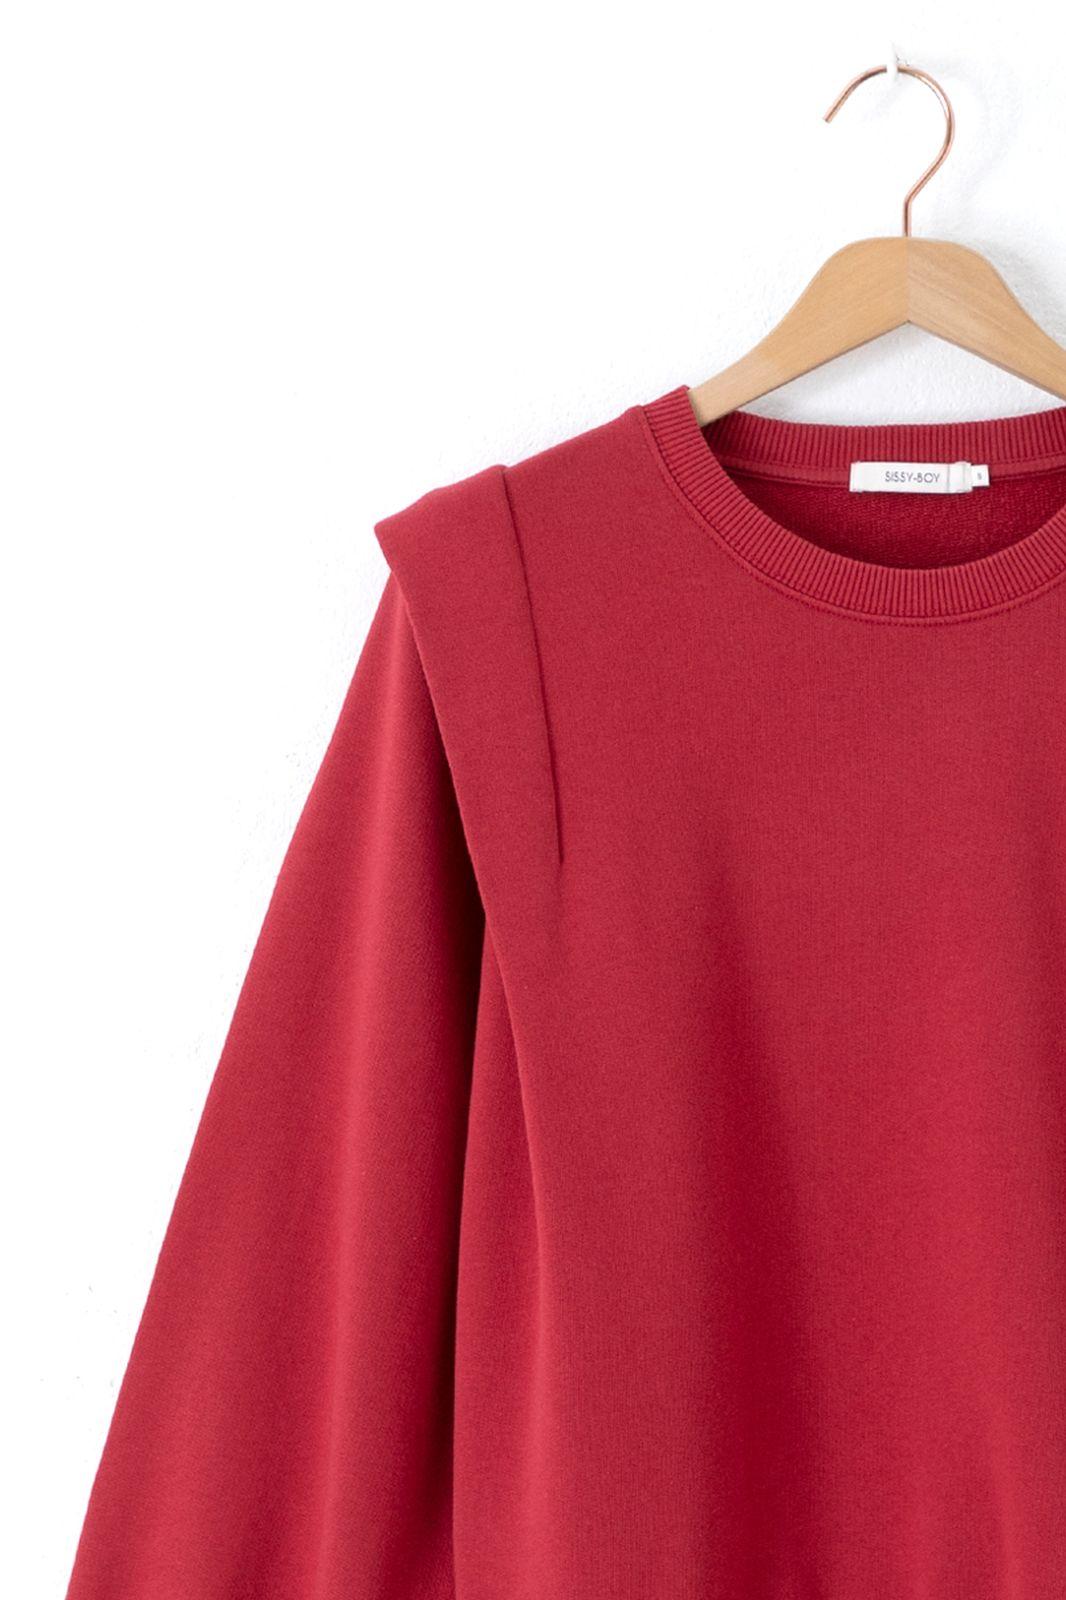 Rode sweater met schouder details - Dames | Sissy-Boy